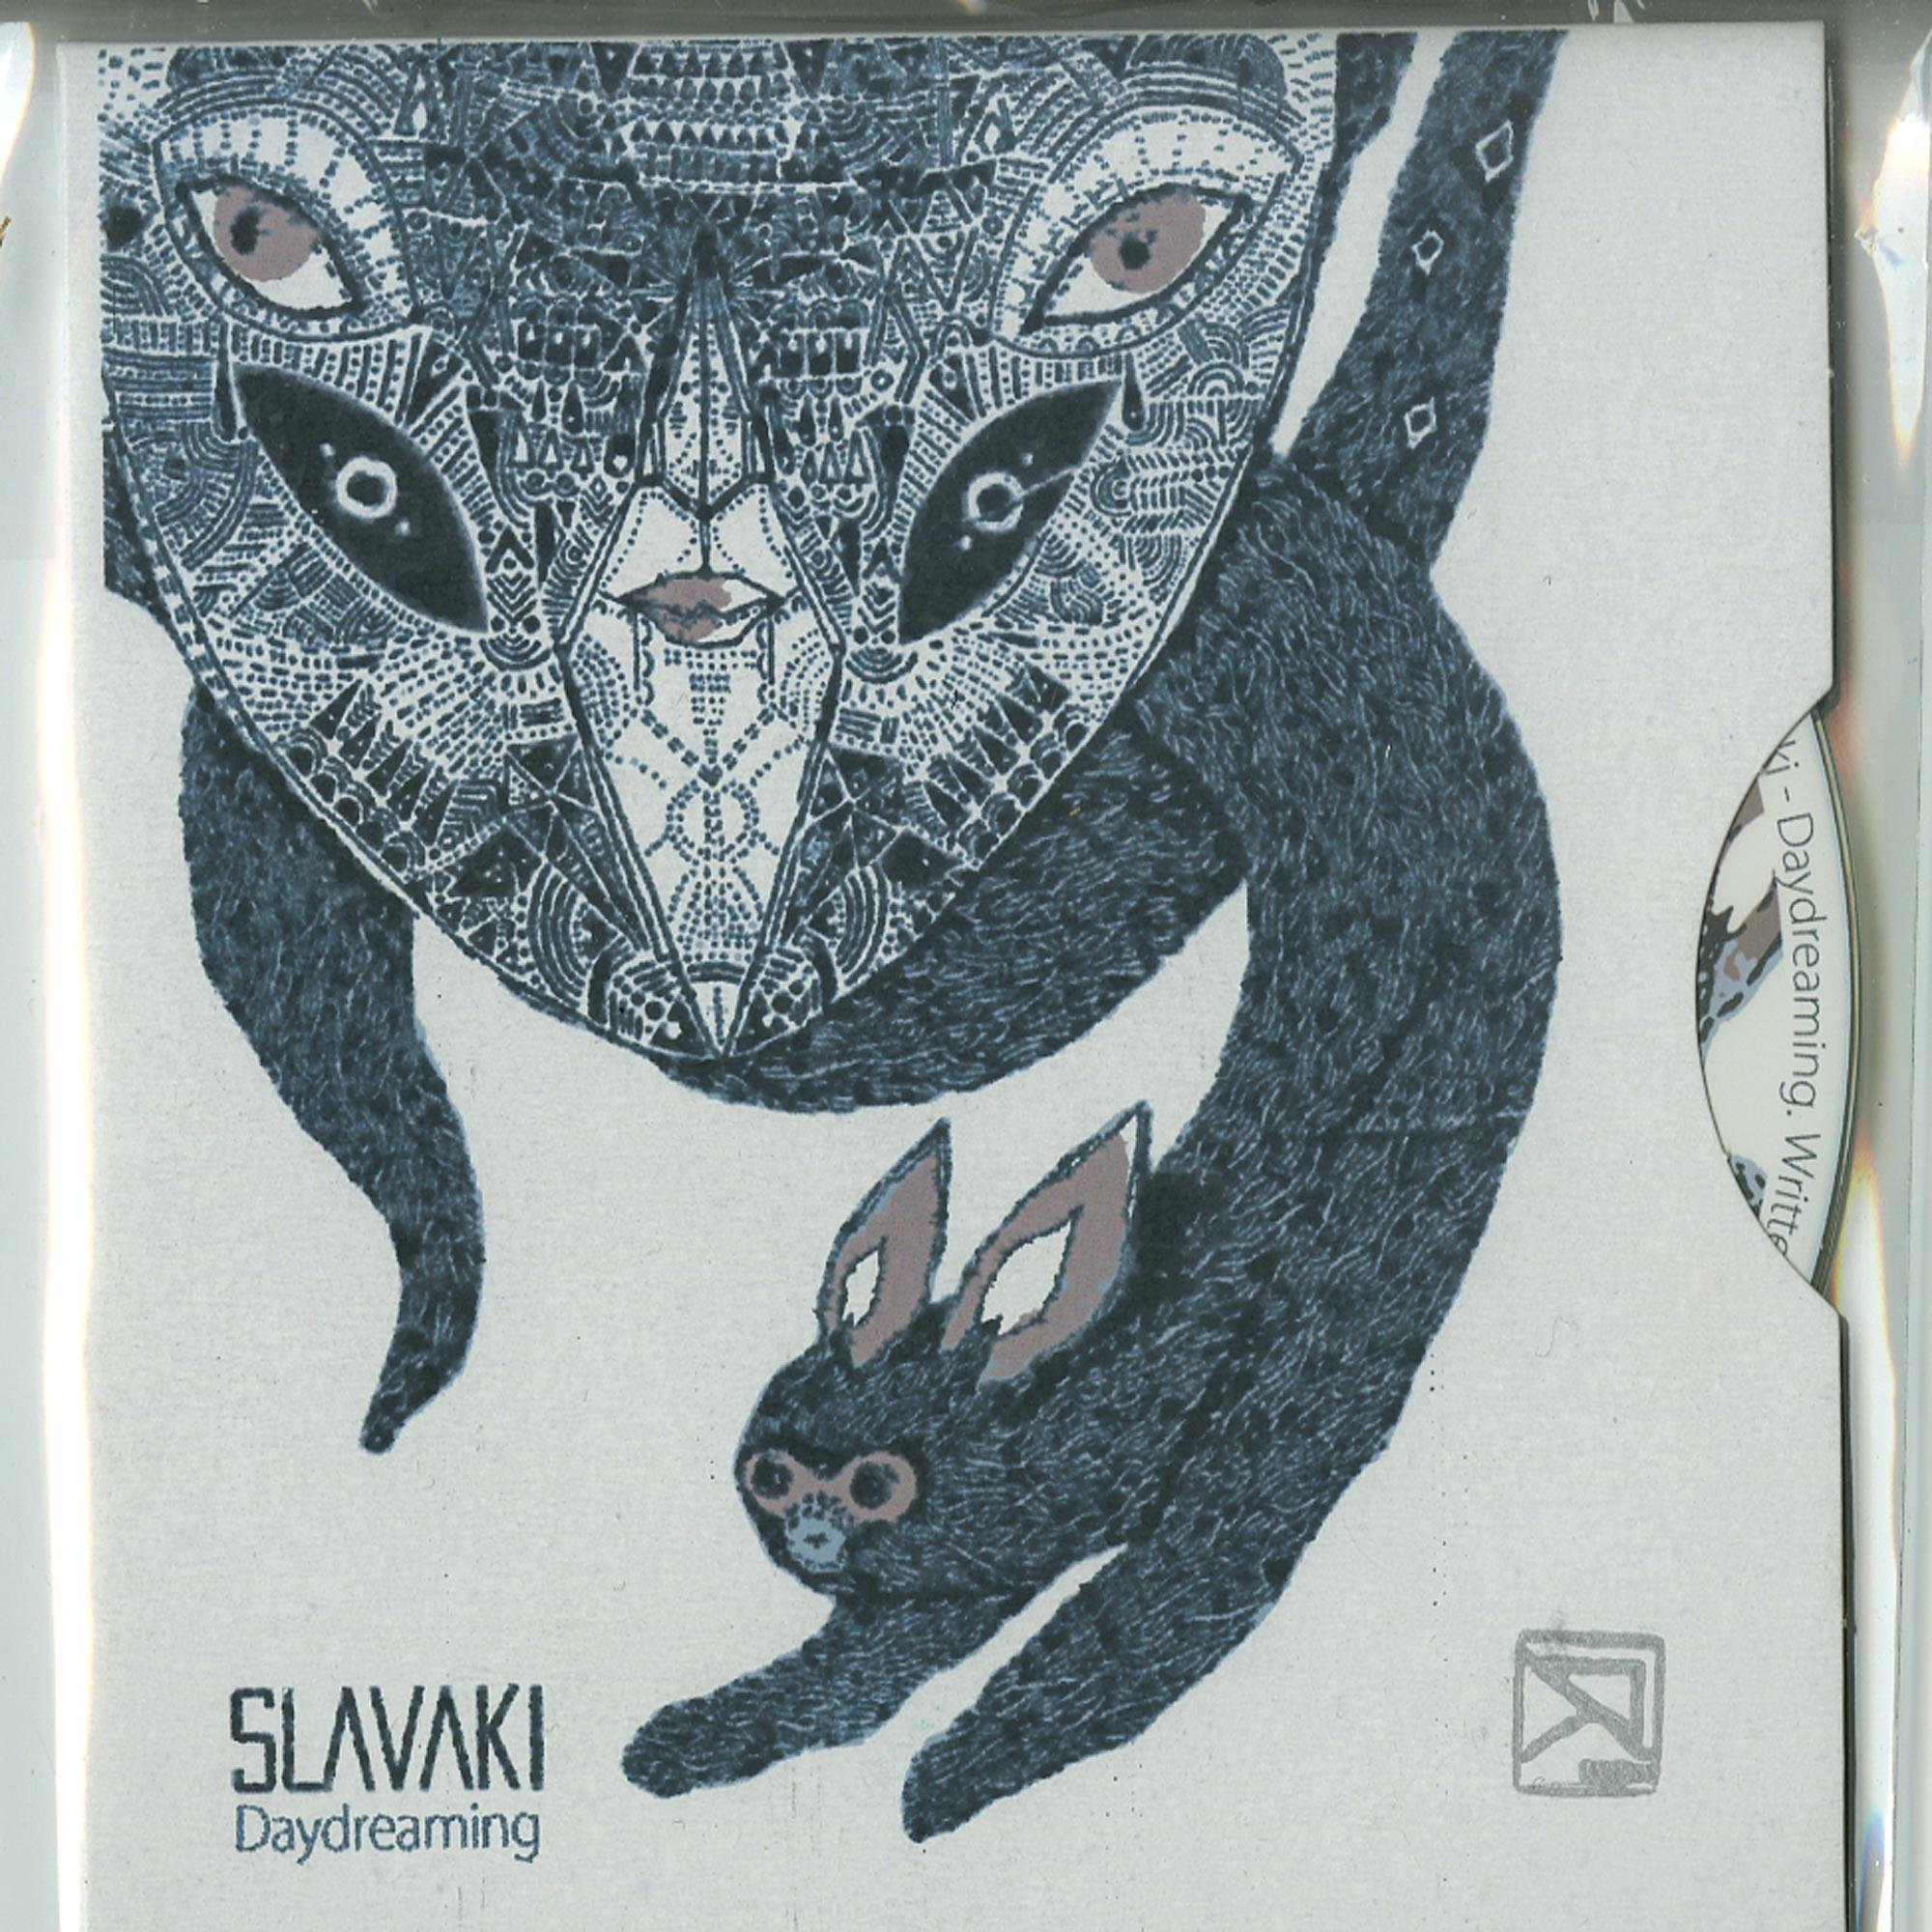 Slavaki - DAYDREAMING